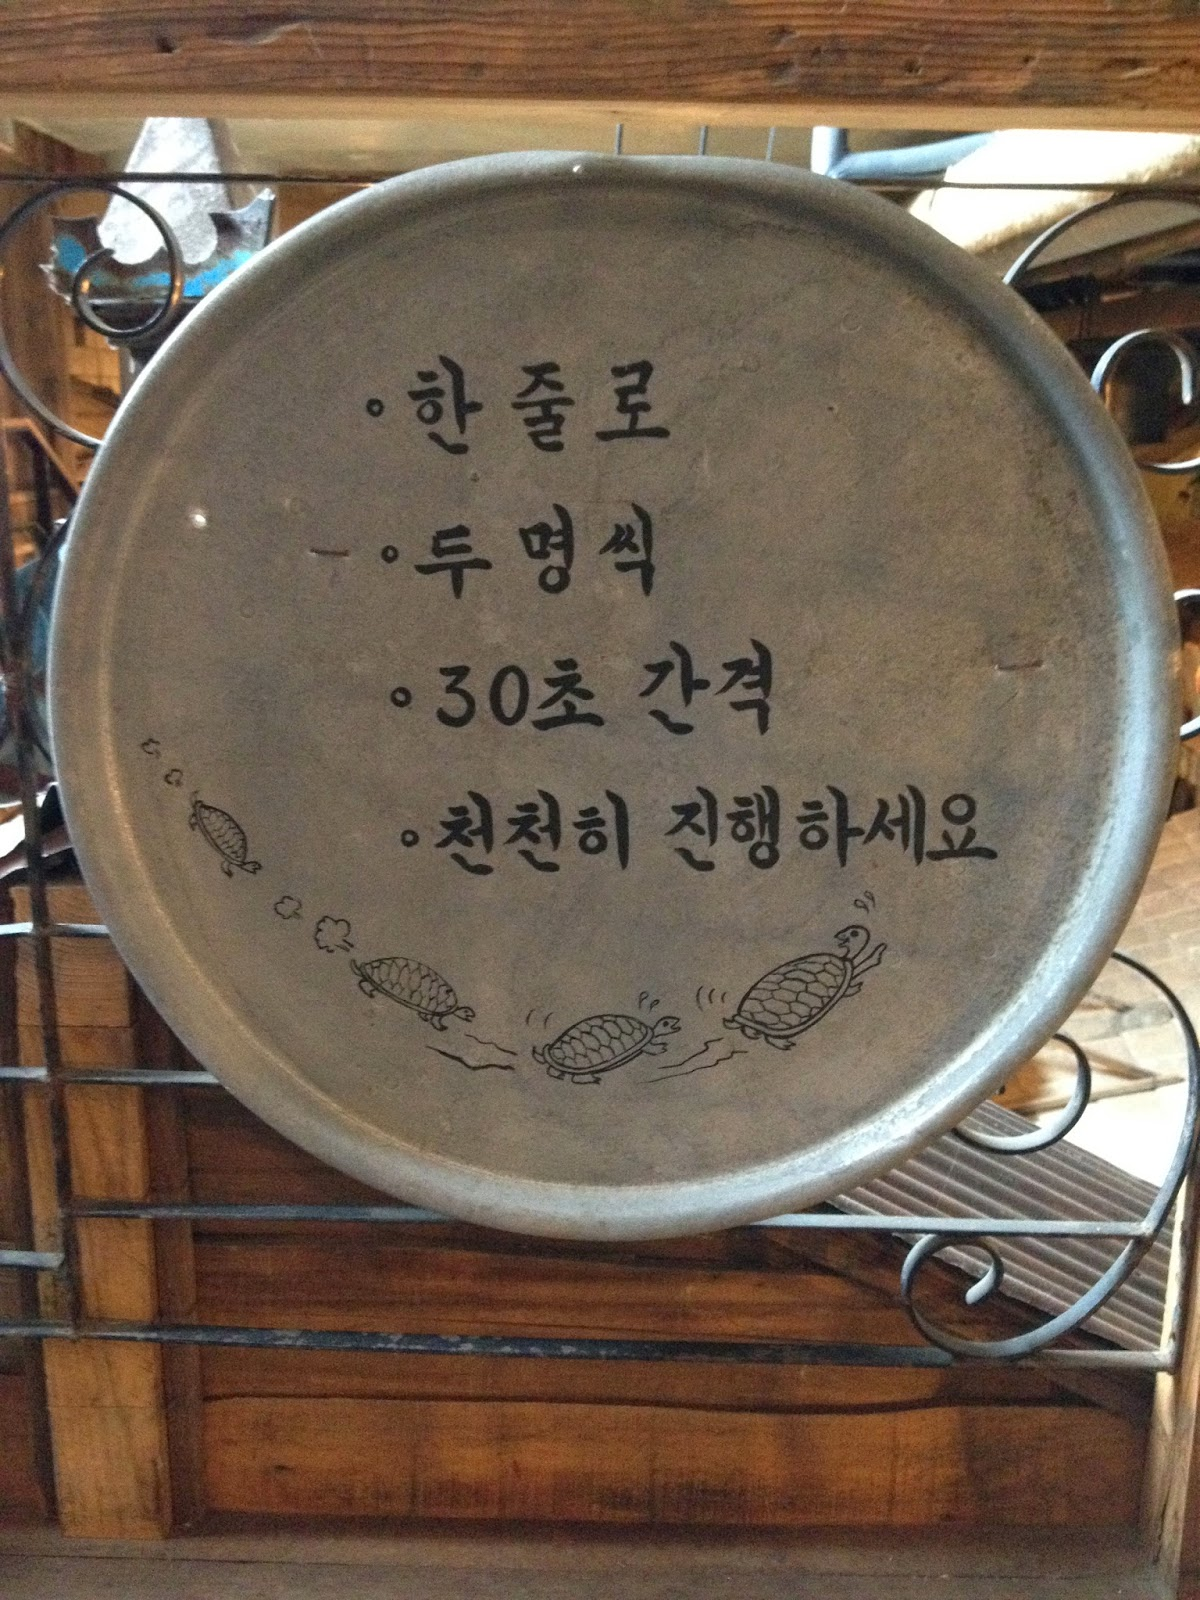 Heyri Art Village in South Korea